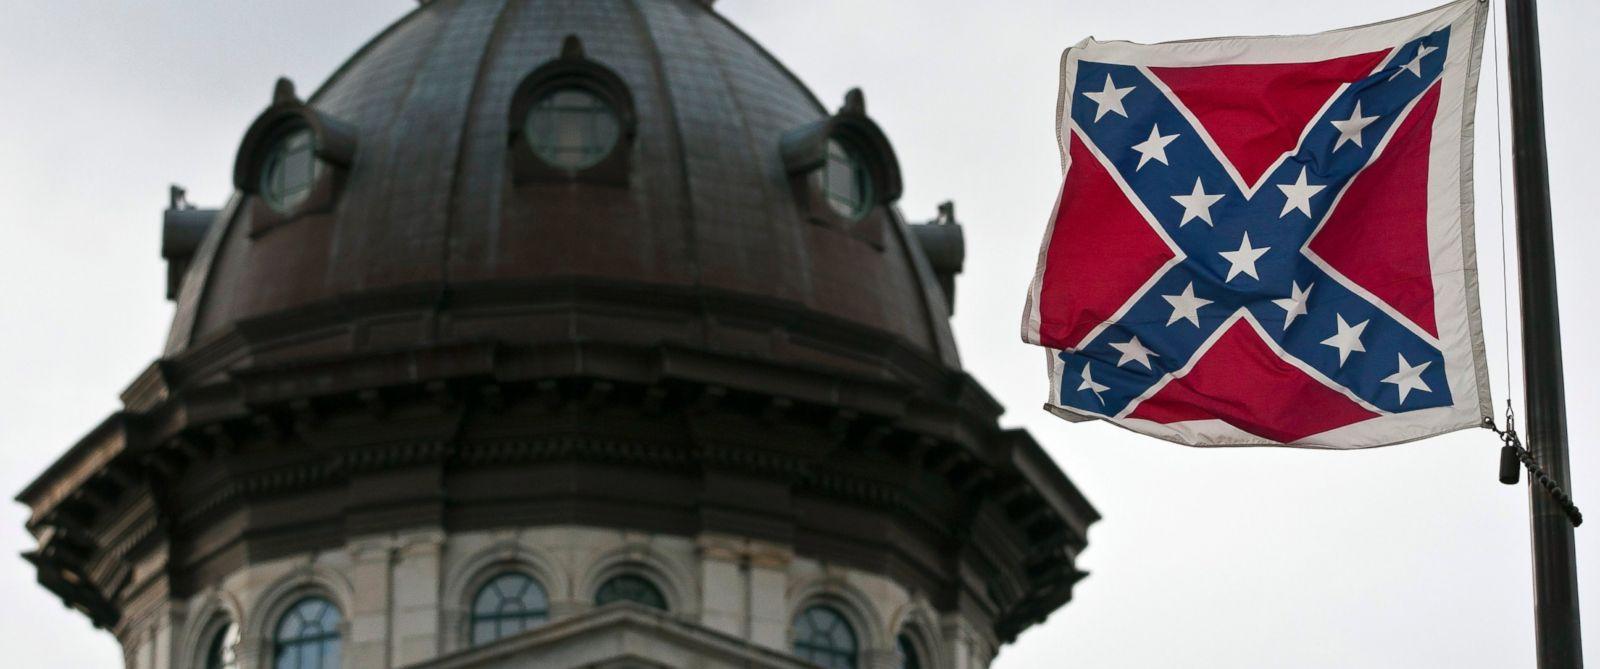 PHOTO: A Confederate flag flies outside the South Carolina State House in Columbia, South Carolina January 17, 2012.